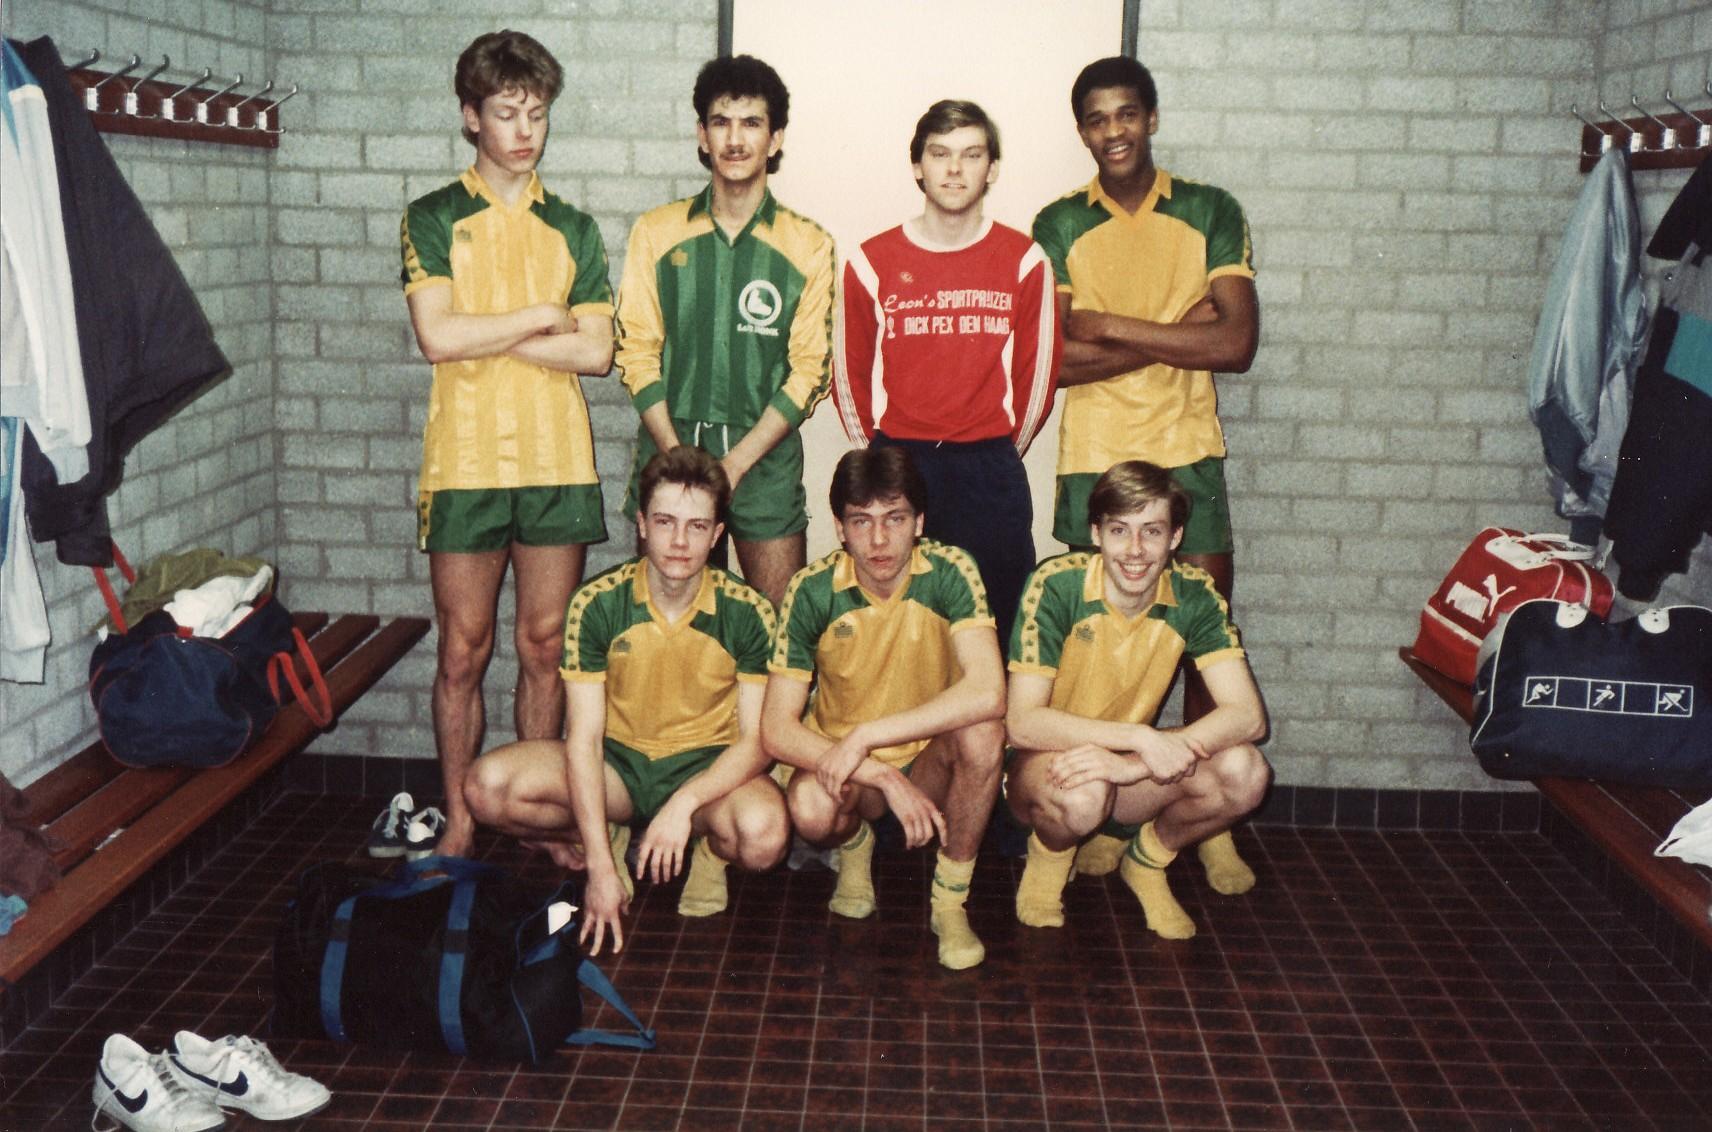 Sander, Hassan, Wim, Gil, Johan, Ron & Marcel ('86) - Copy